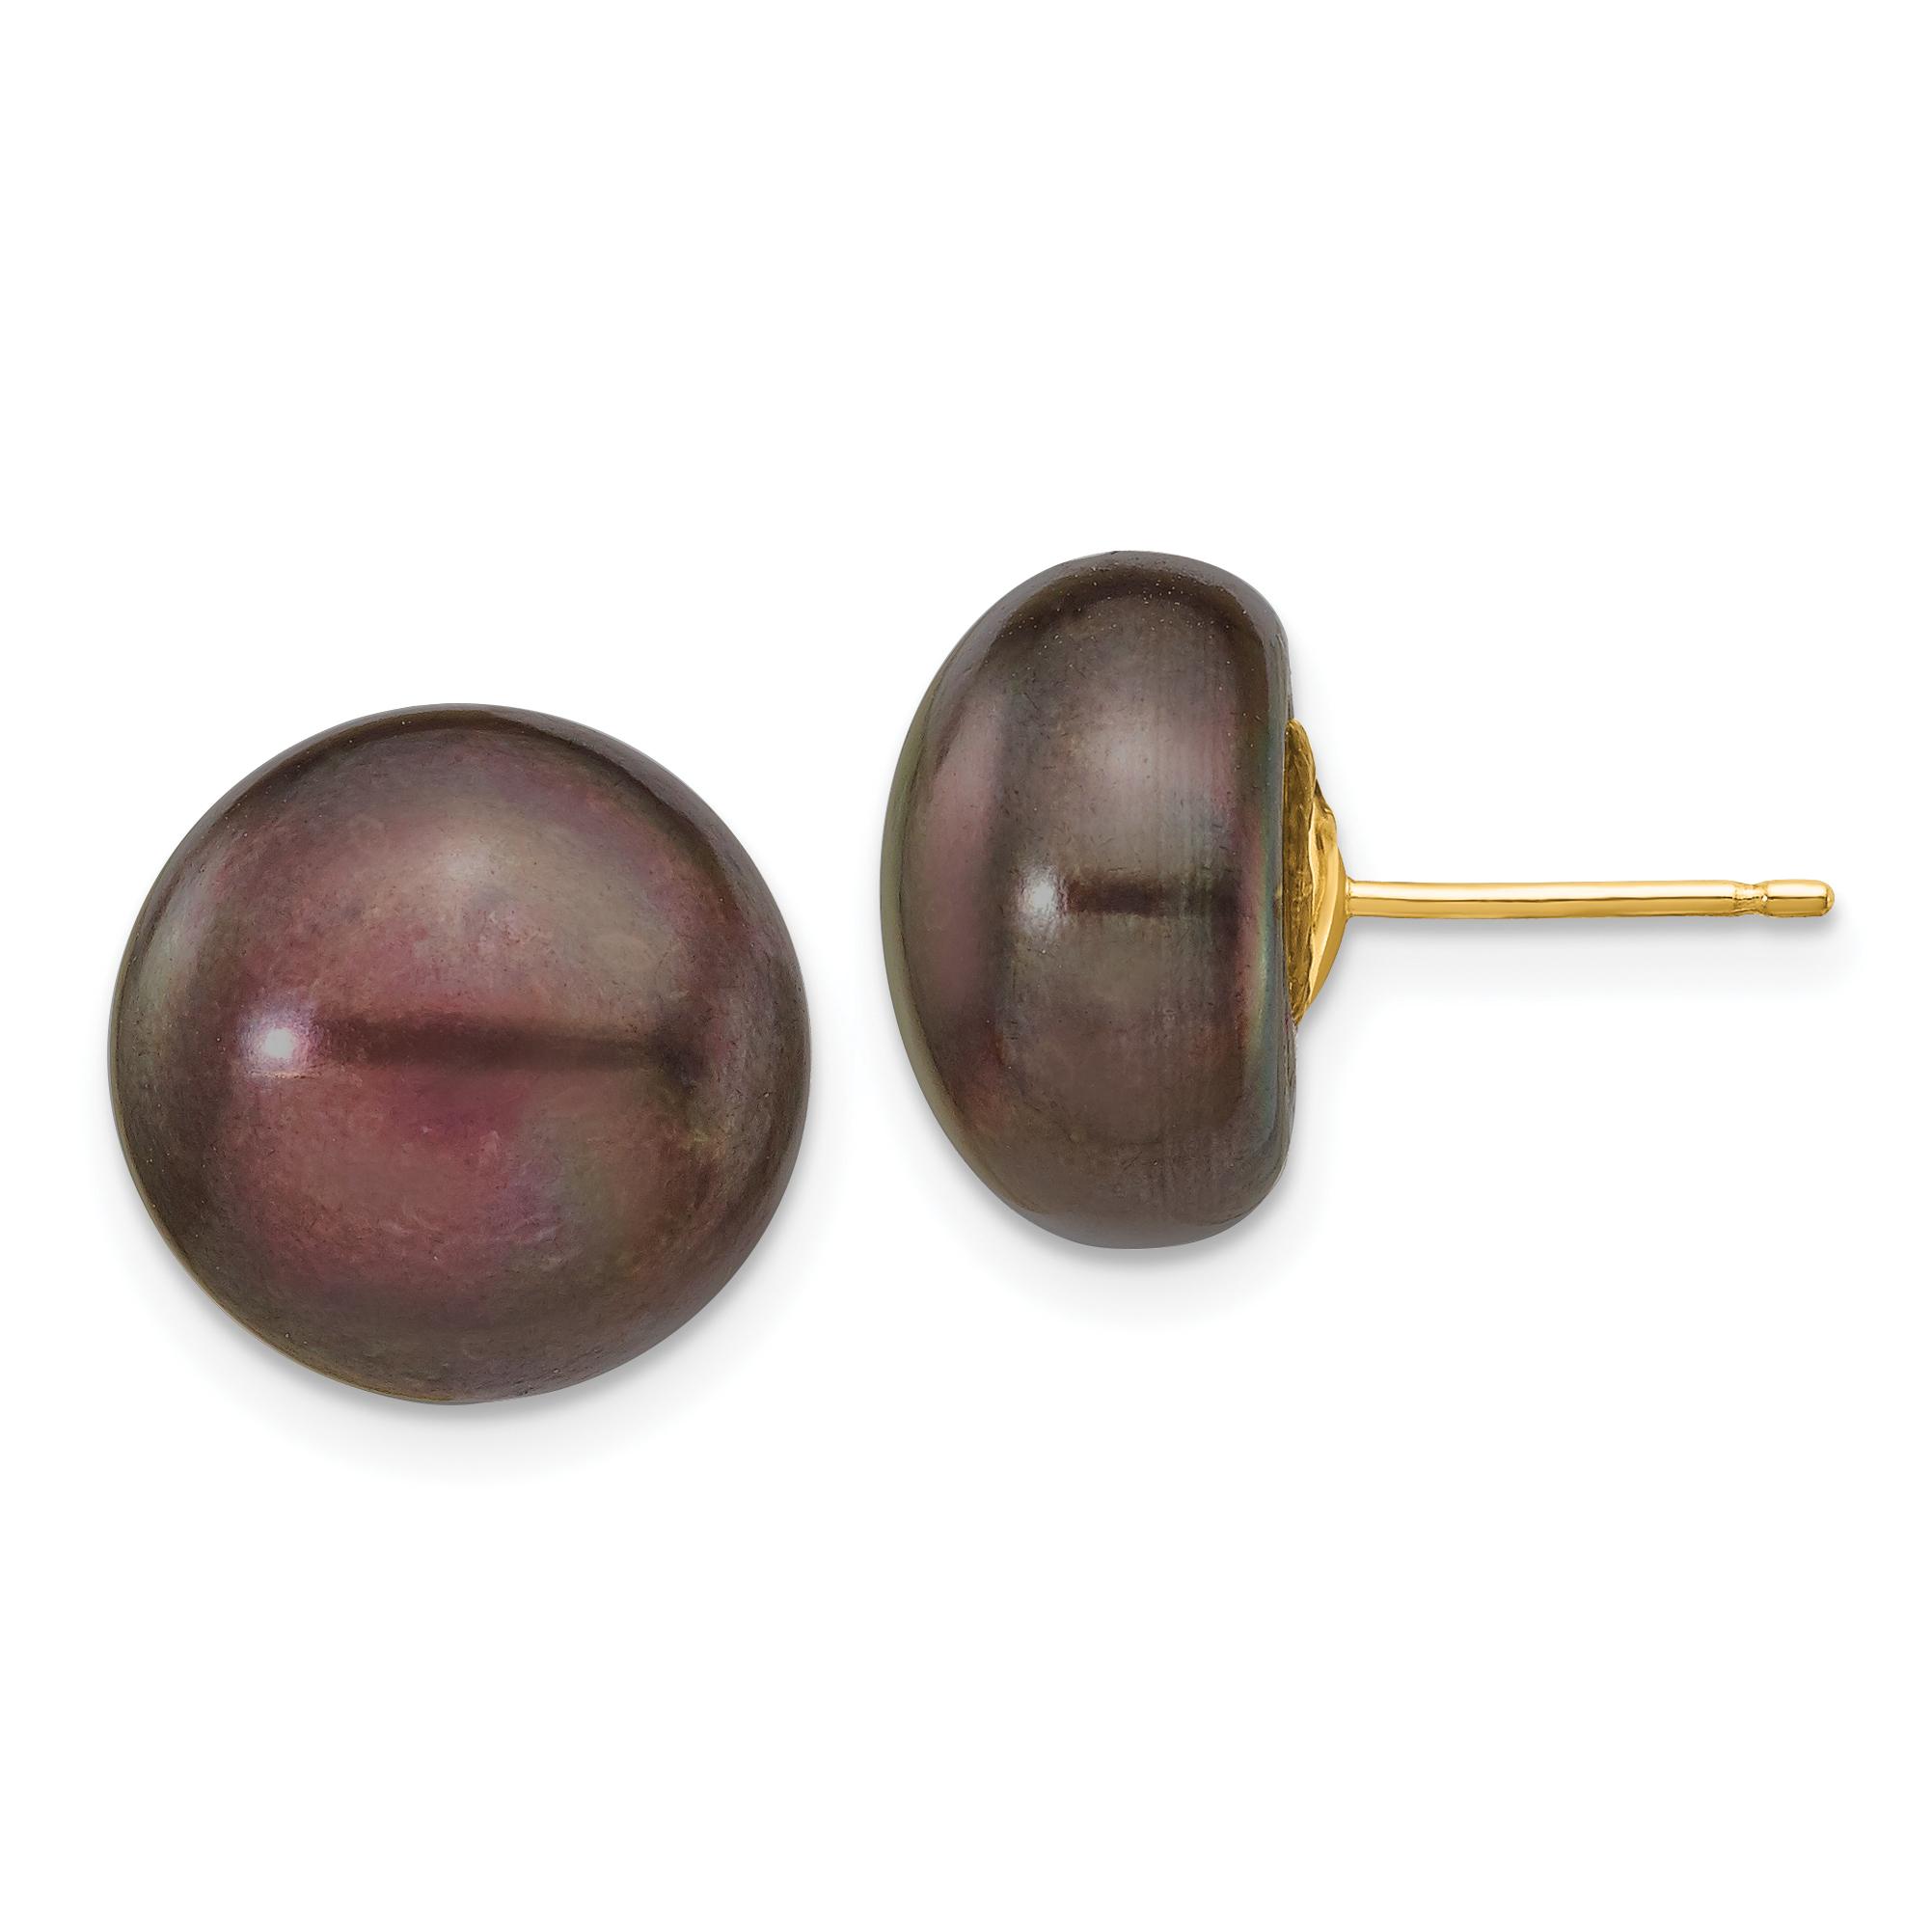 14K Yellow Gold 12-13mm Black Button FW Cultured Pearl Stud Earrings - image 2 de 2